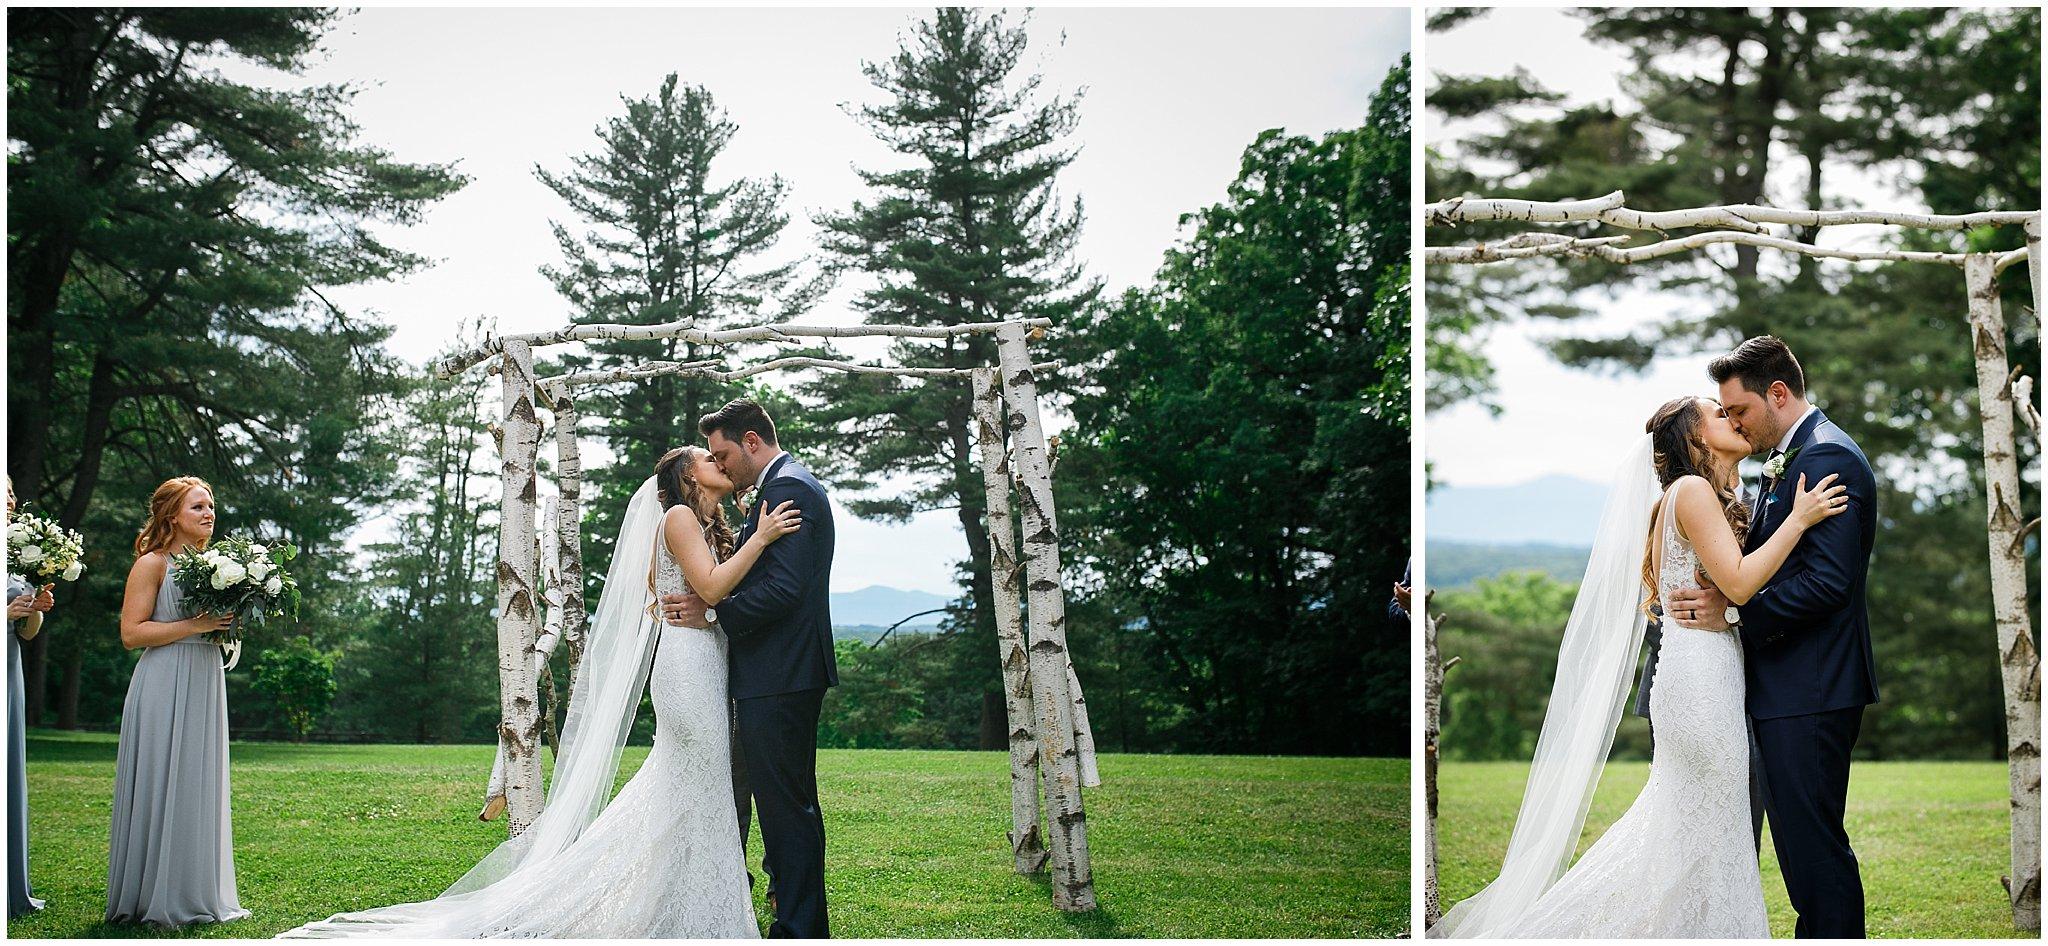 Hudson Valley Weddings at the Hill Hudson New York Wedding Photographer55.jpg